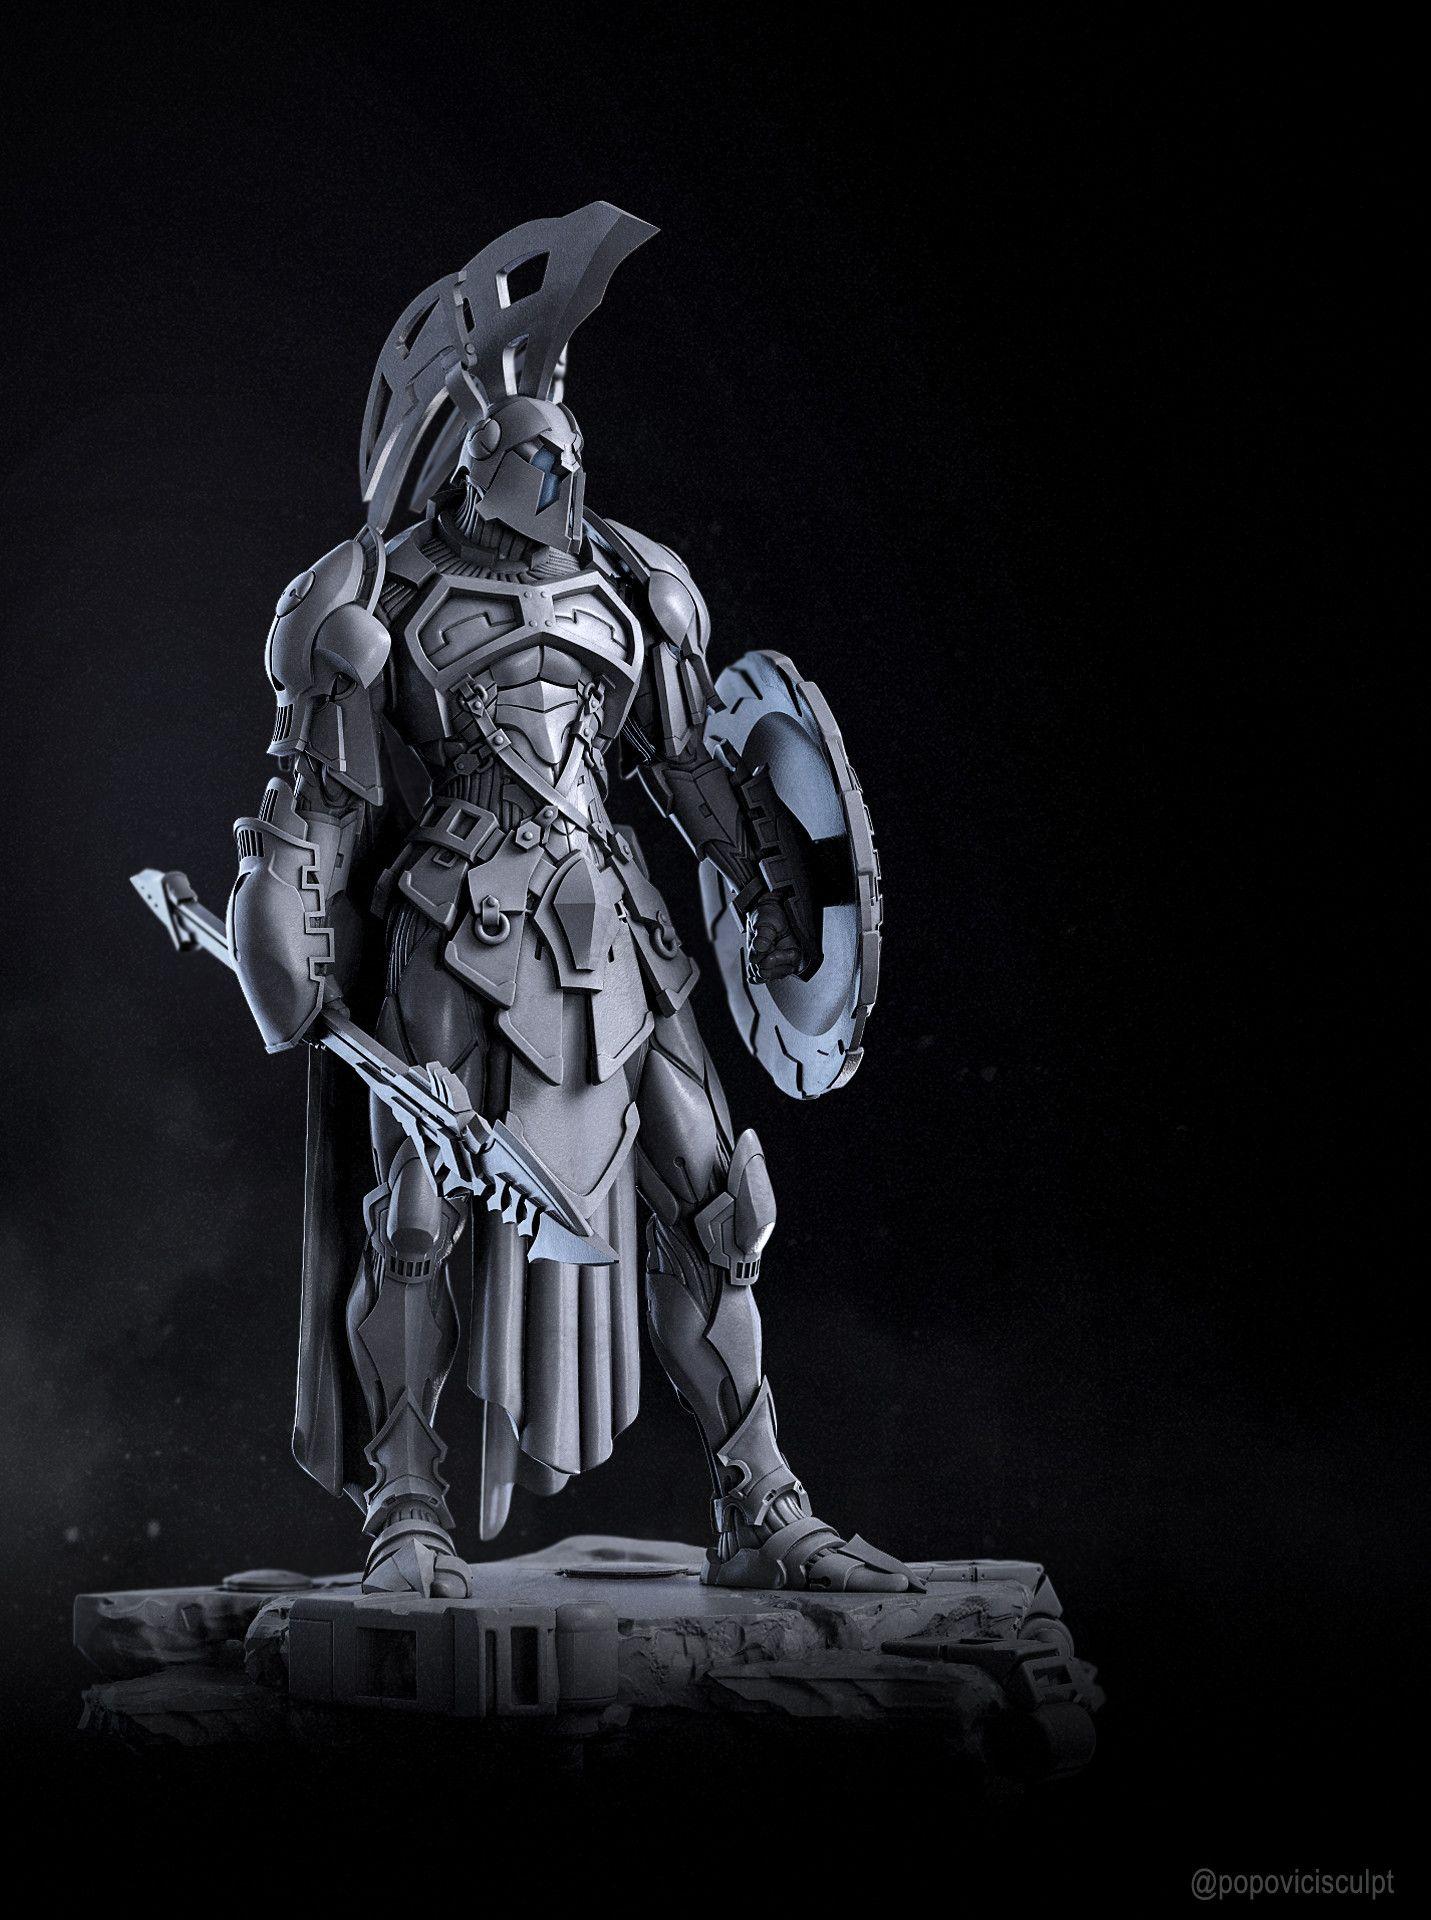 ArtStation - Ares, God of War, Alexei Popovici   Guerrier ...